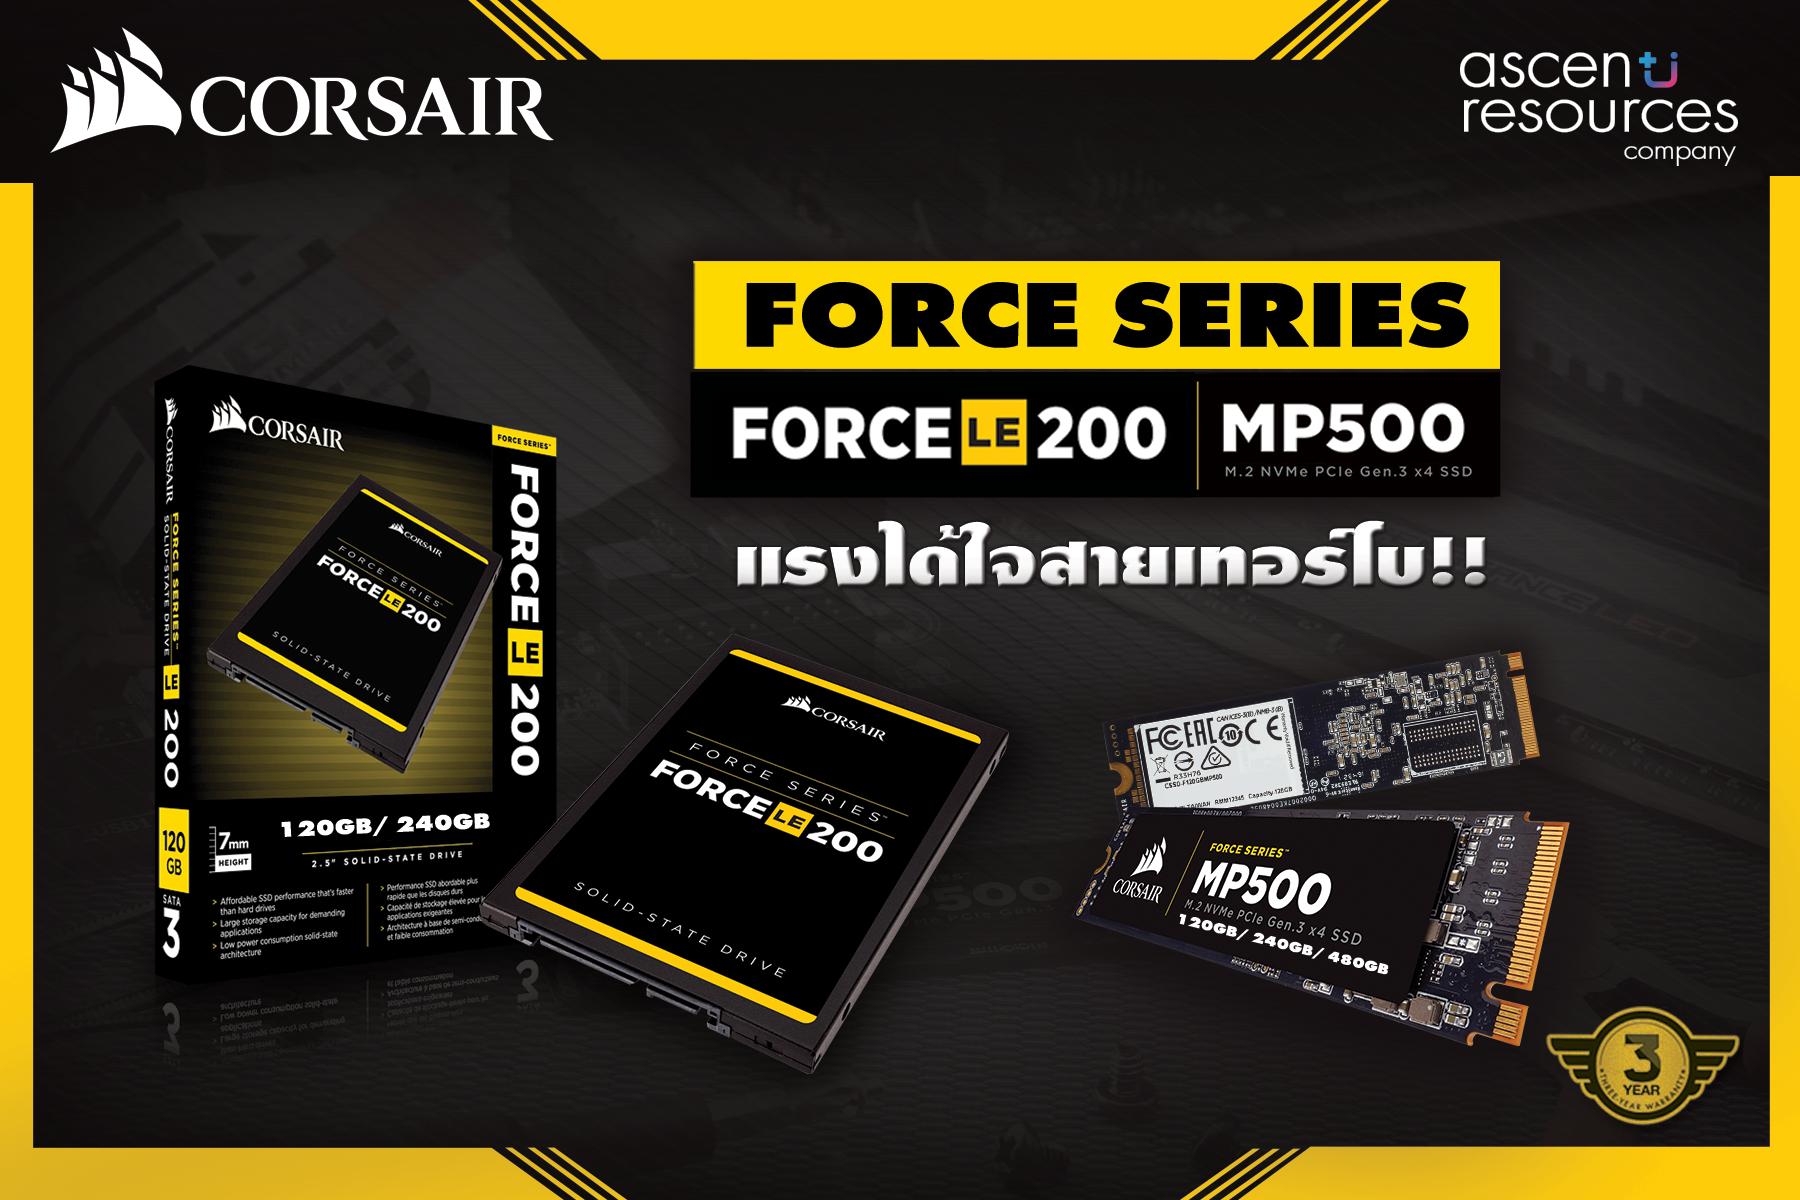 pr corsair 1 Ascenti Resources เผยโฉมน้องใหม่ Solid State Drive แบรนด์ Corsair Force Series แรงได้ใจสายเทอร์โบ !!